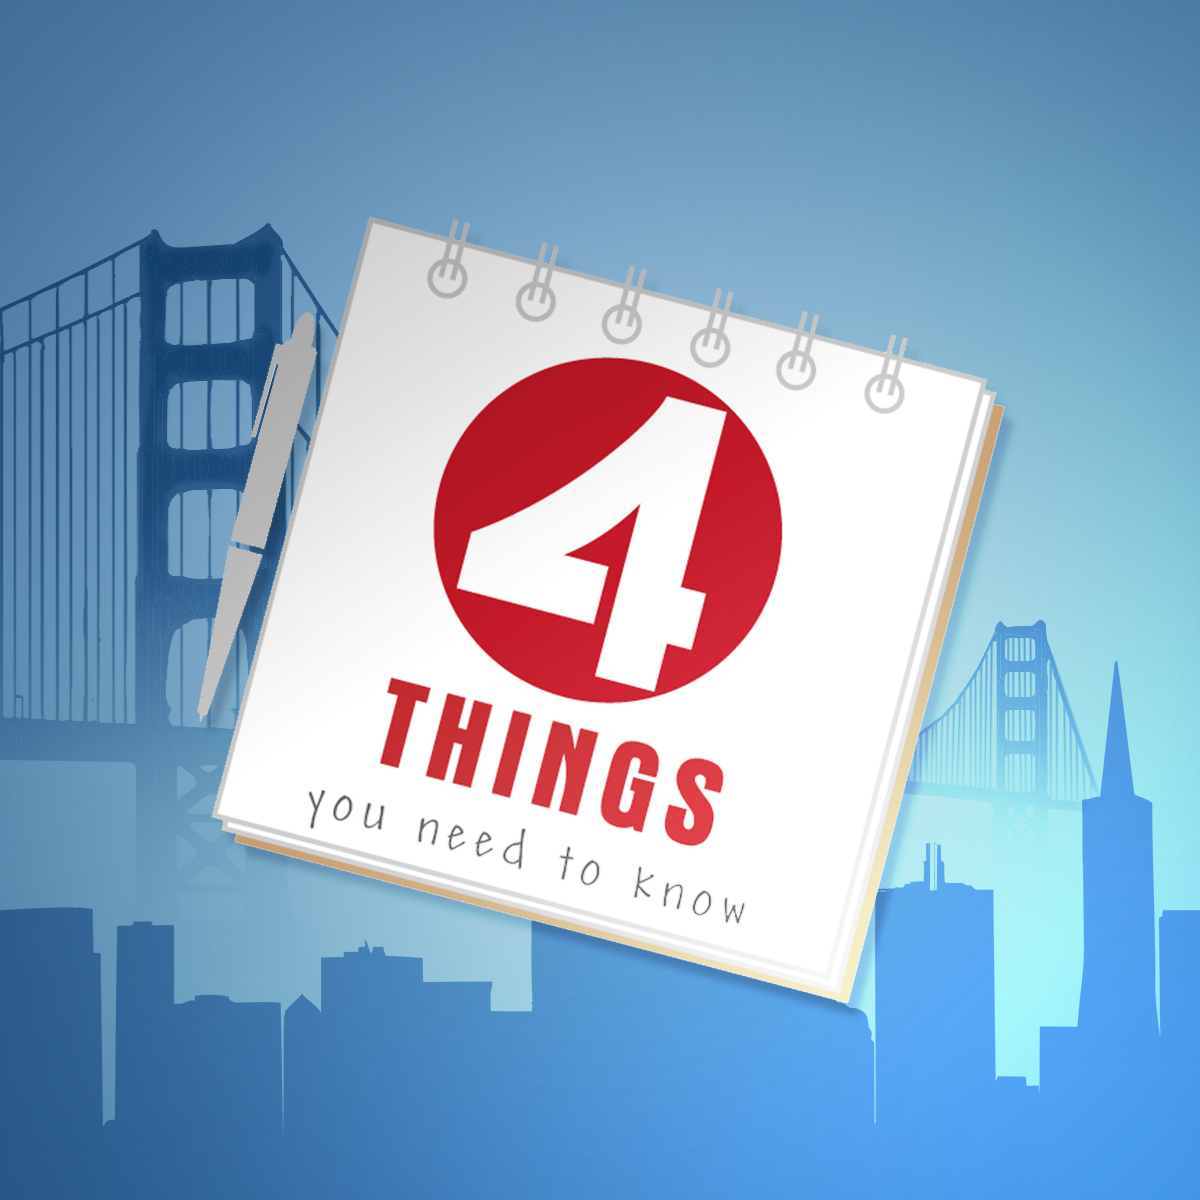 4 Things You Need to Know BG 2_1527195296330.jpg.jpg